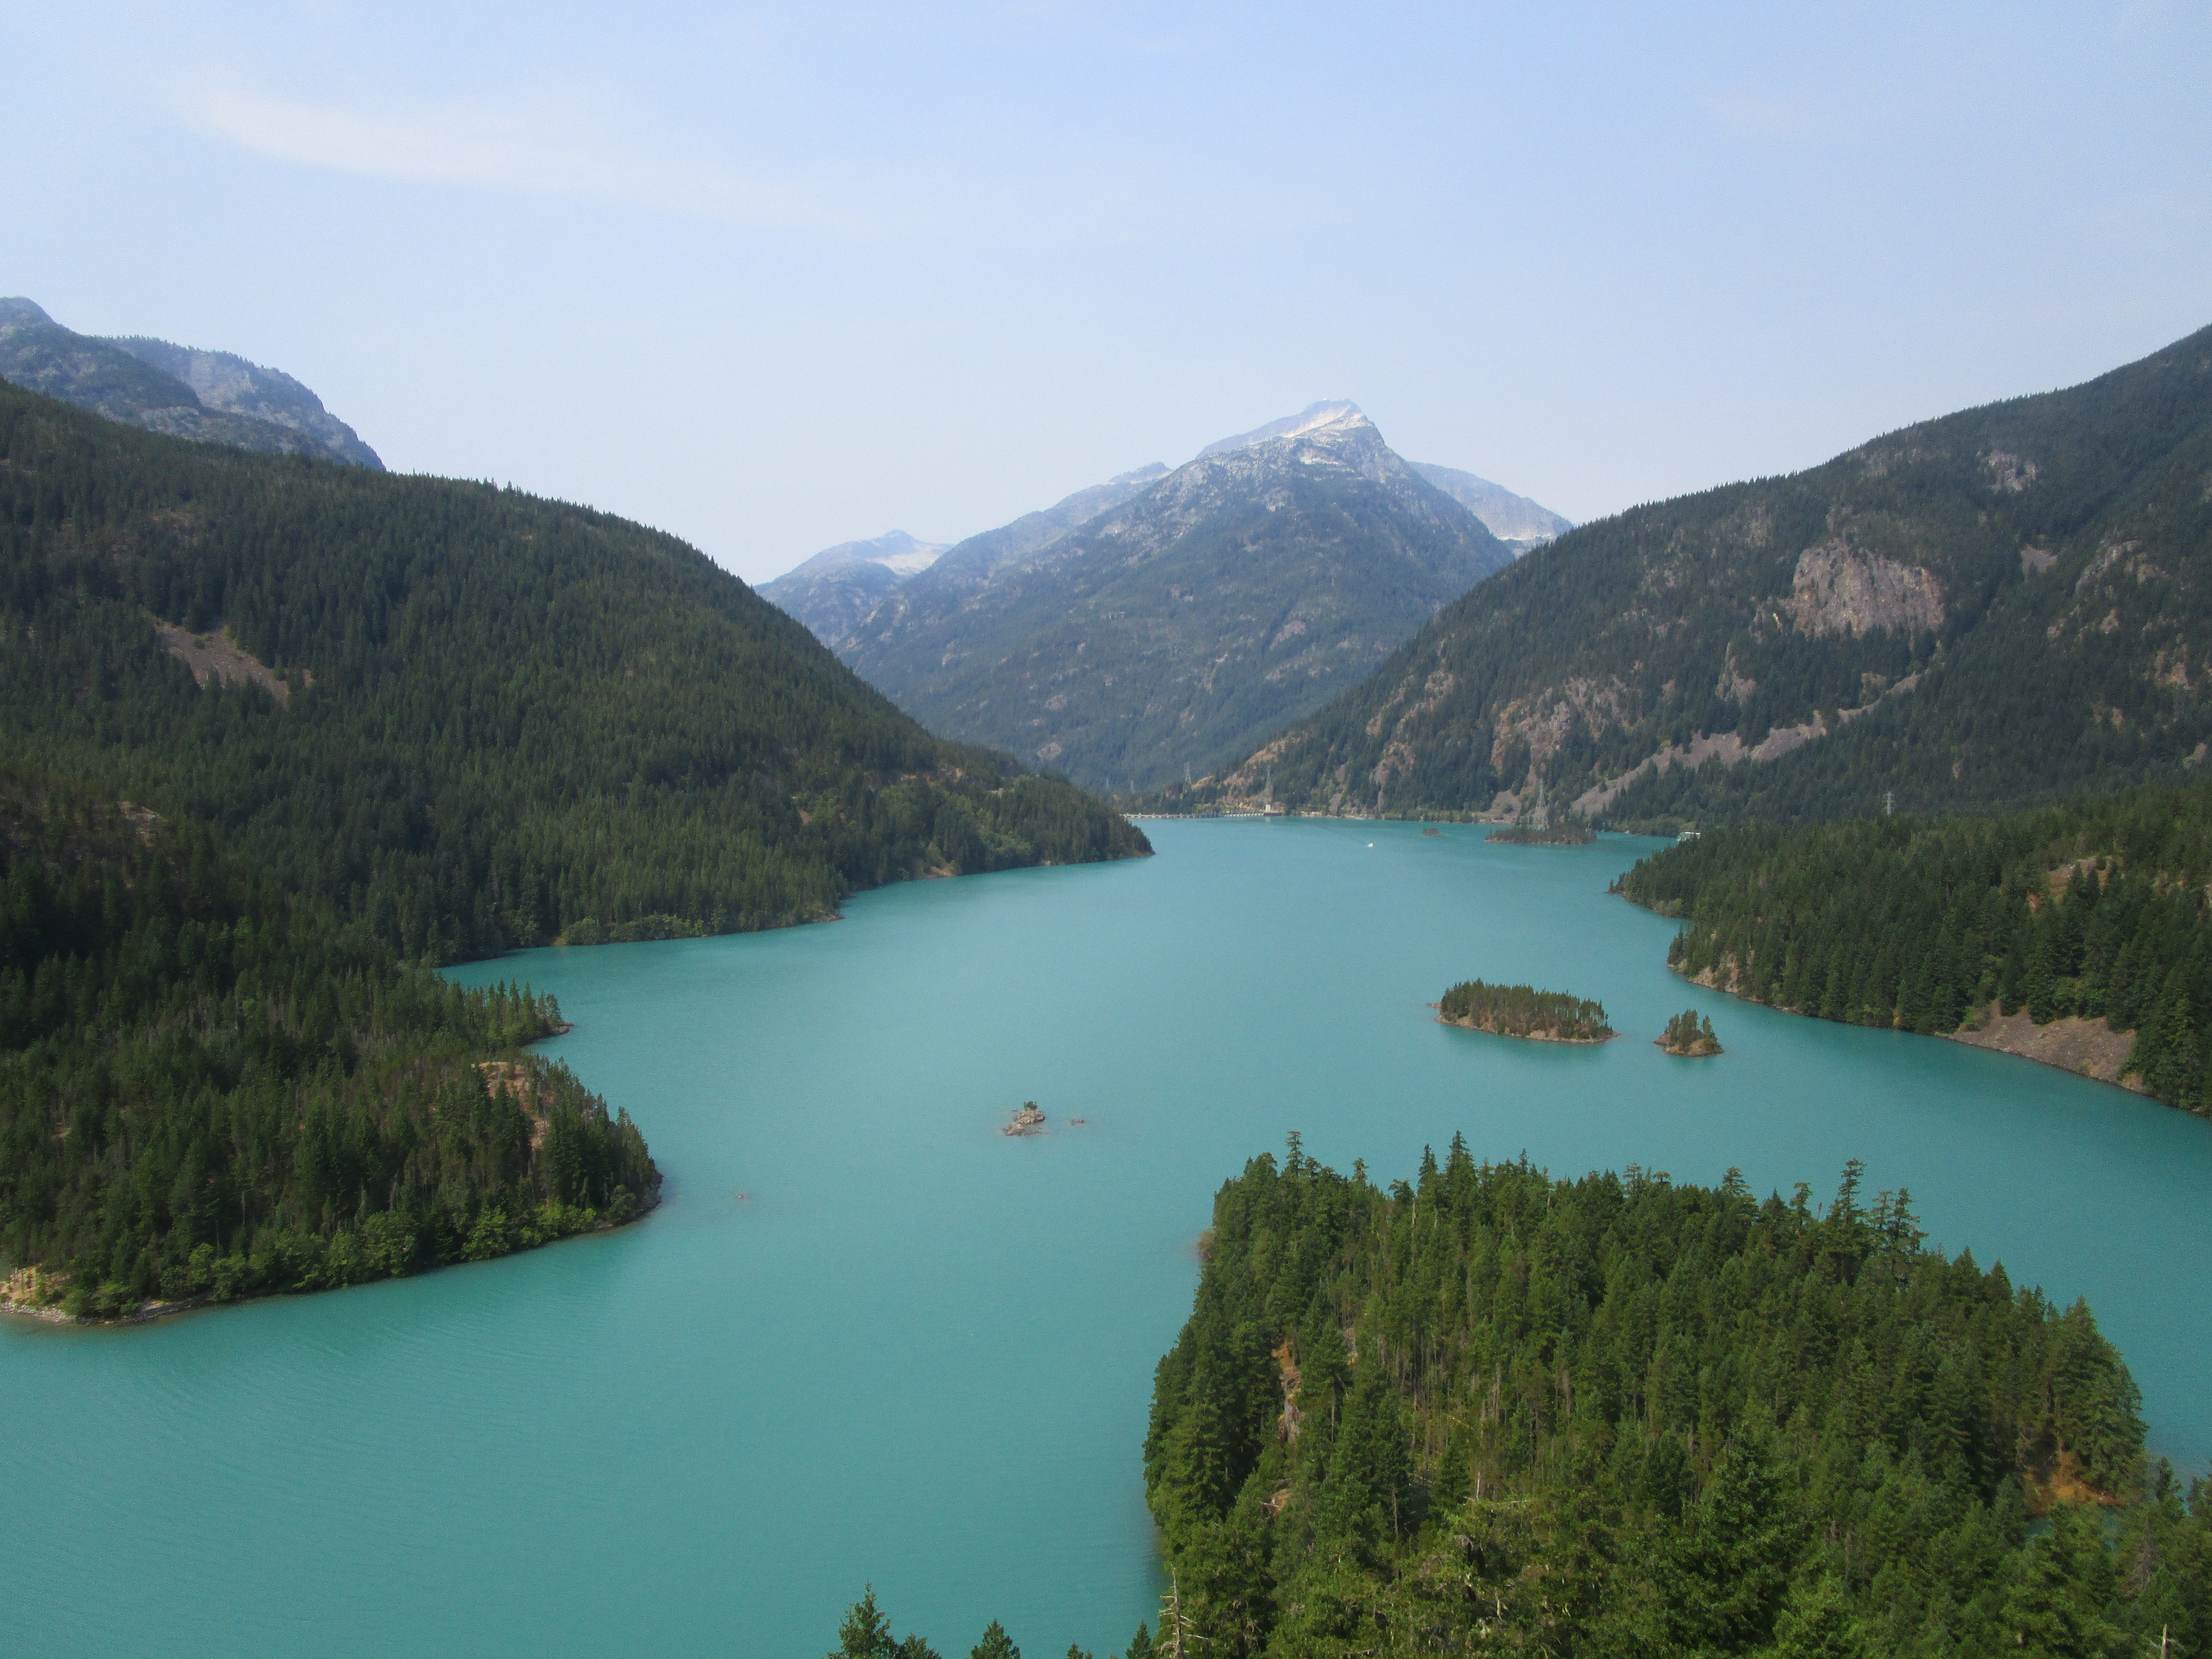 Diablo Lake in North Cascades National Park